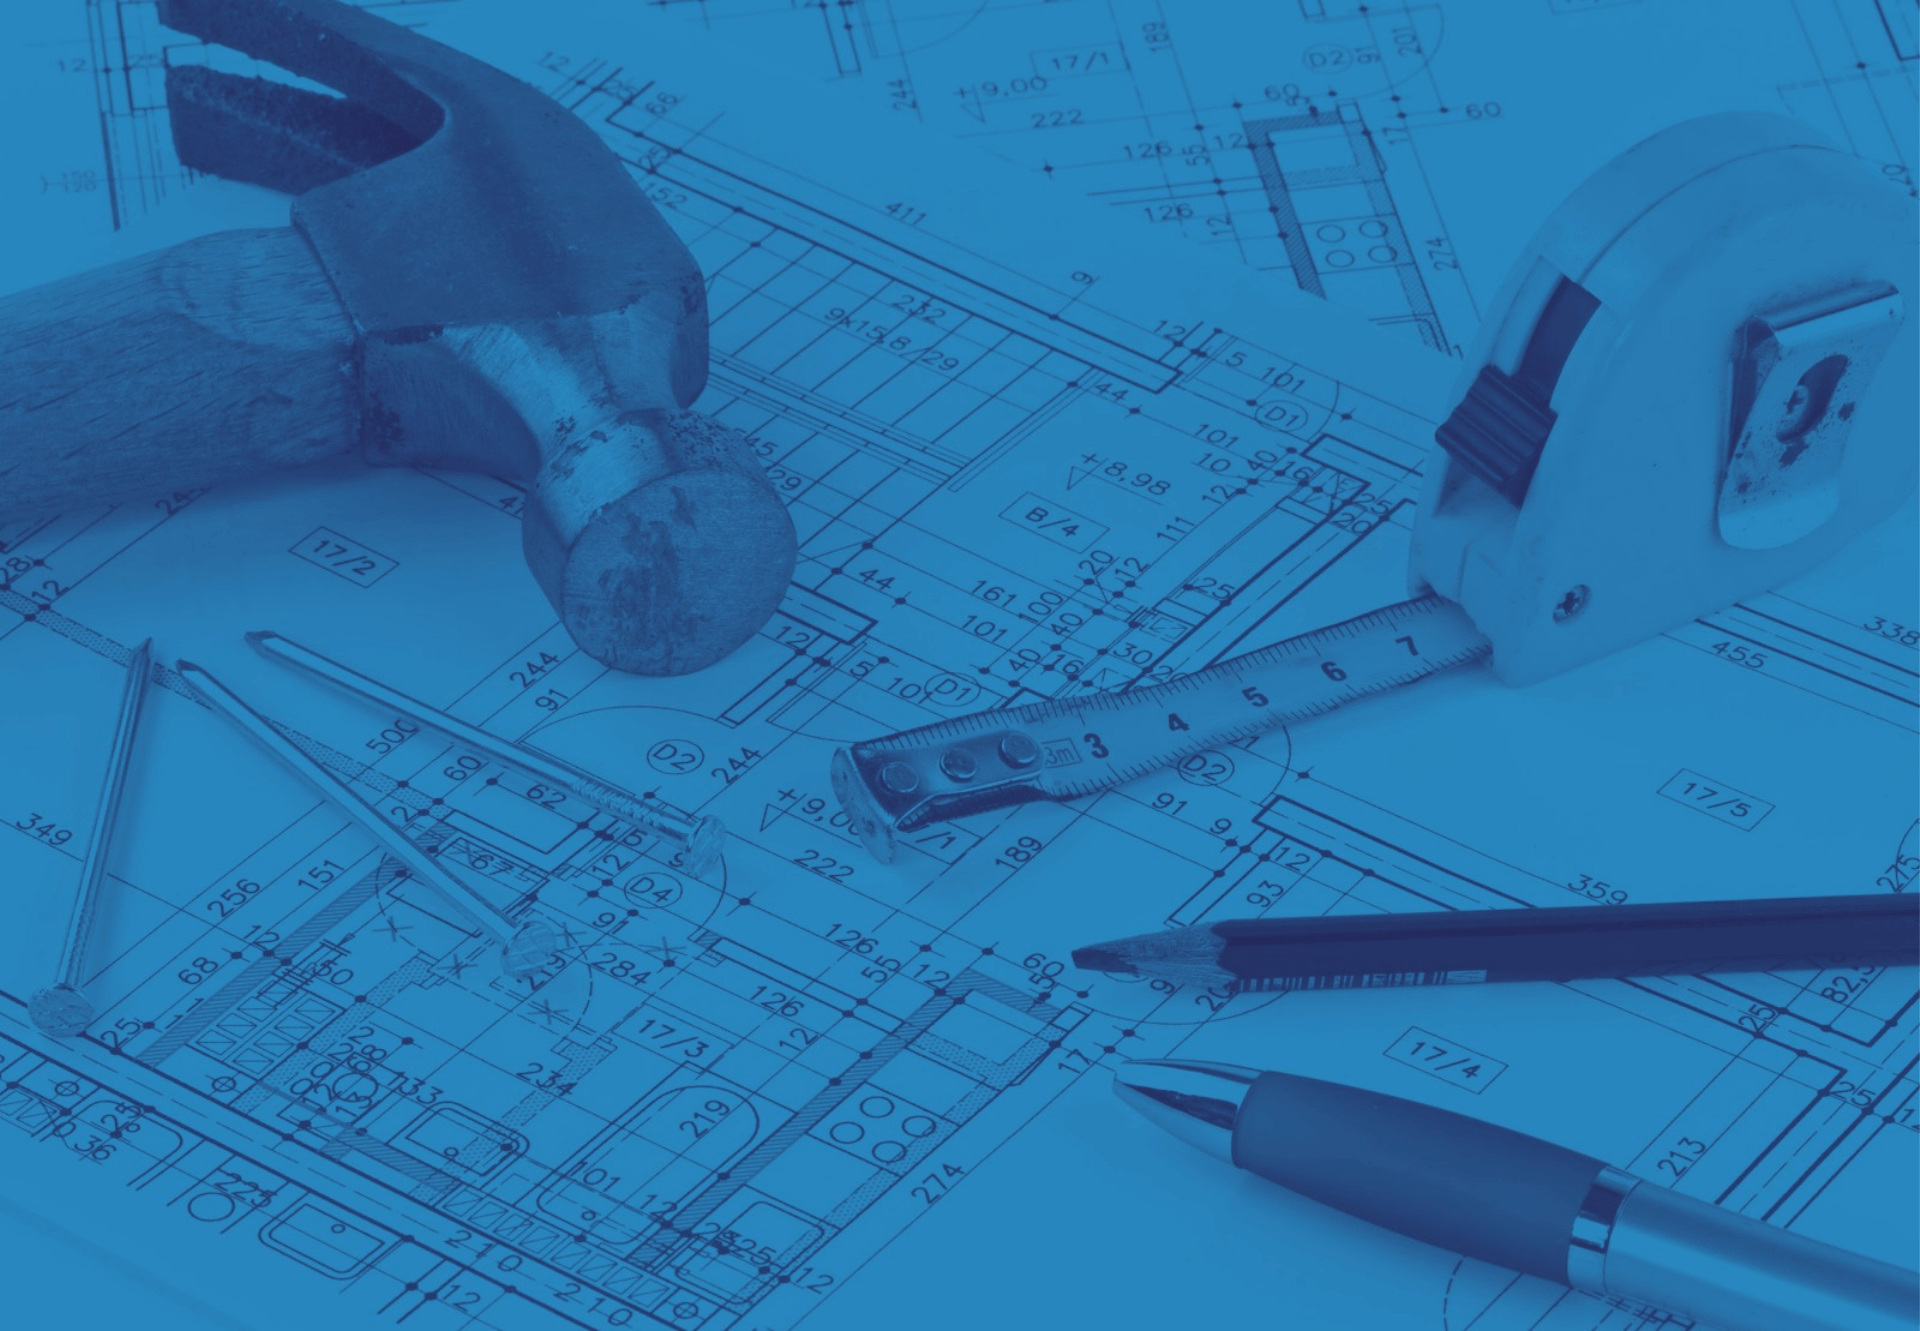 Renovations-plan-tools-pencil-pen-tape-measurer-blue